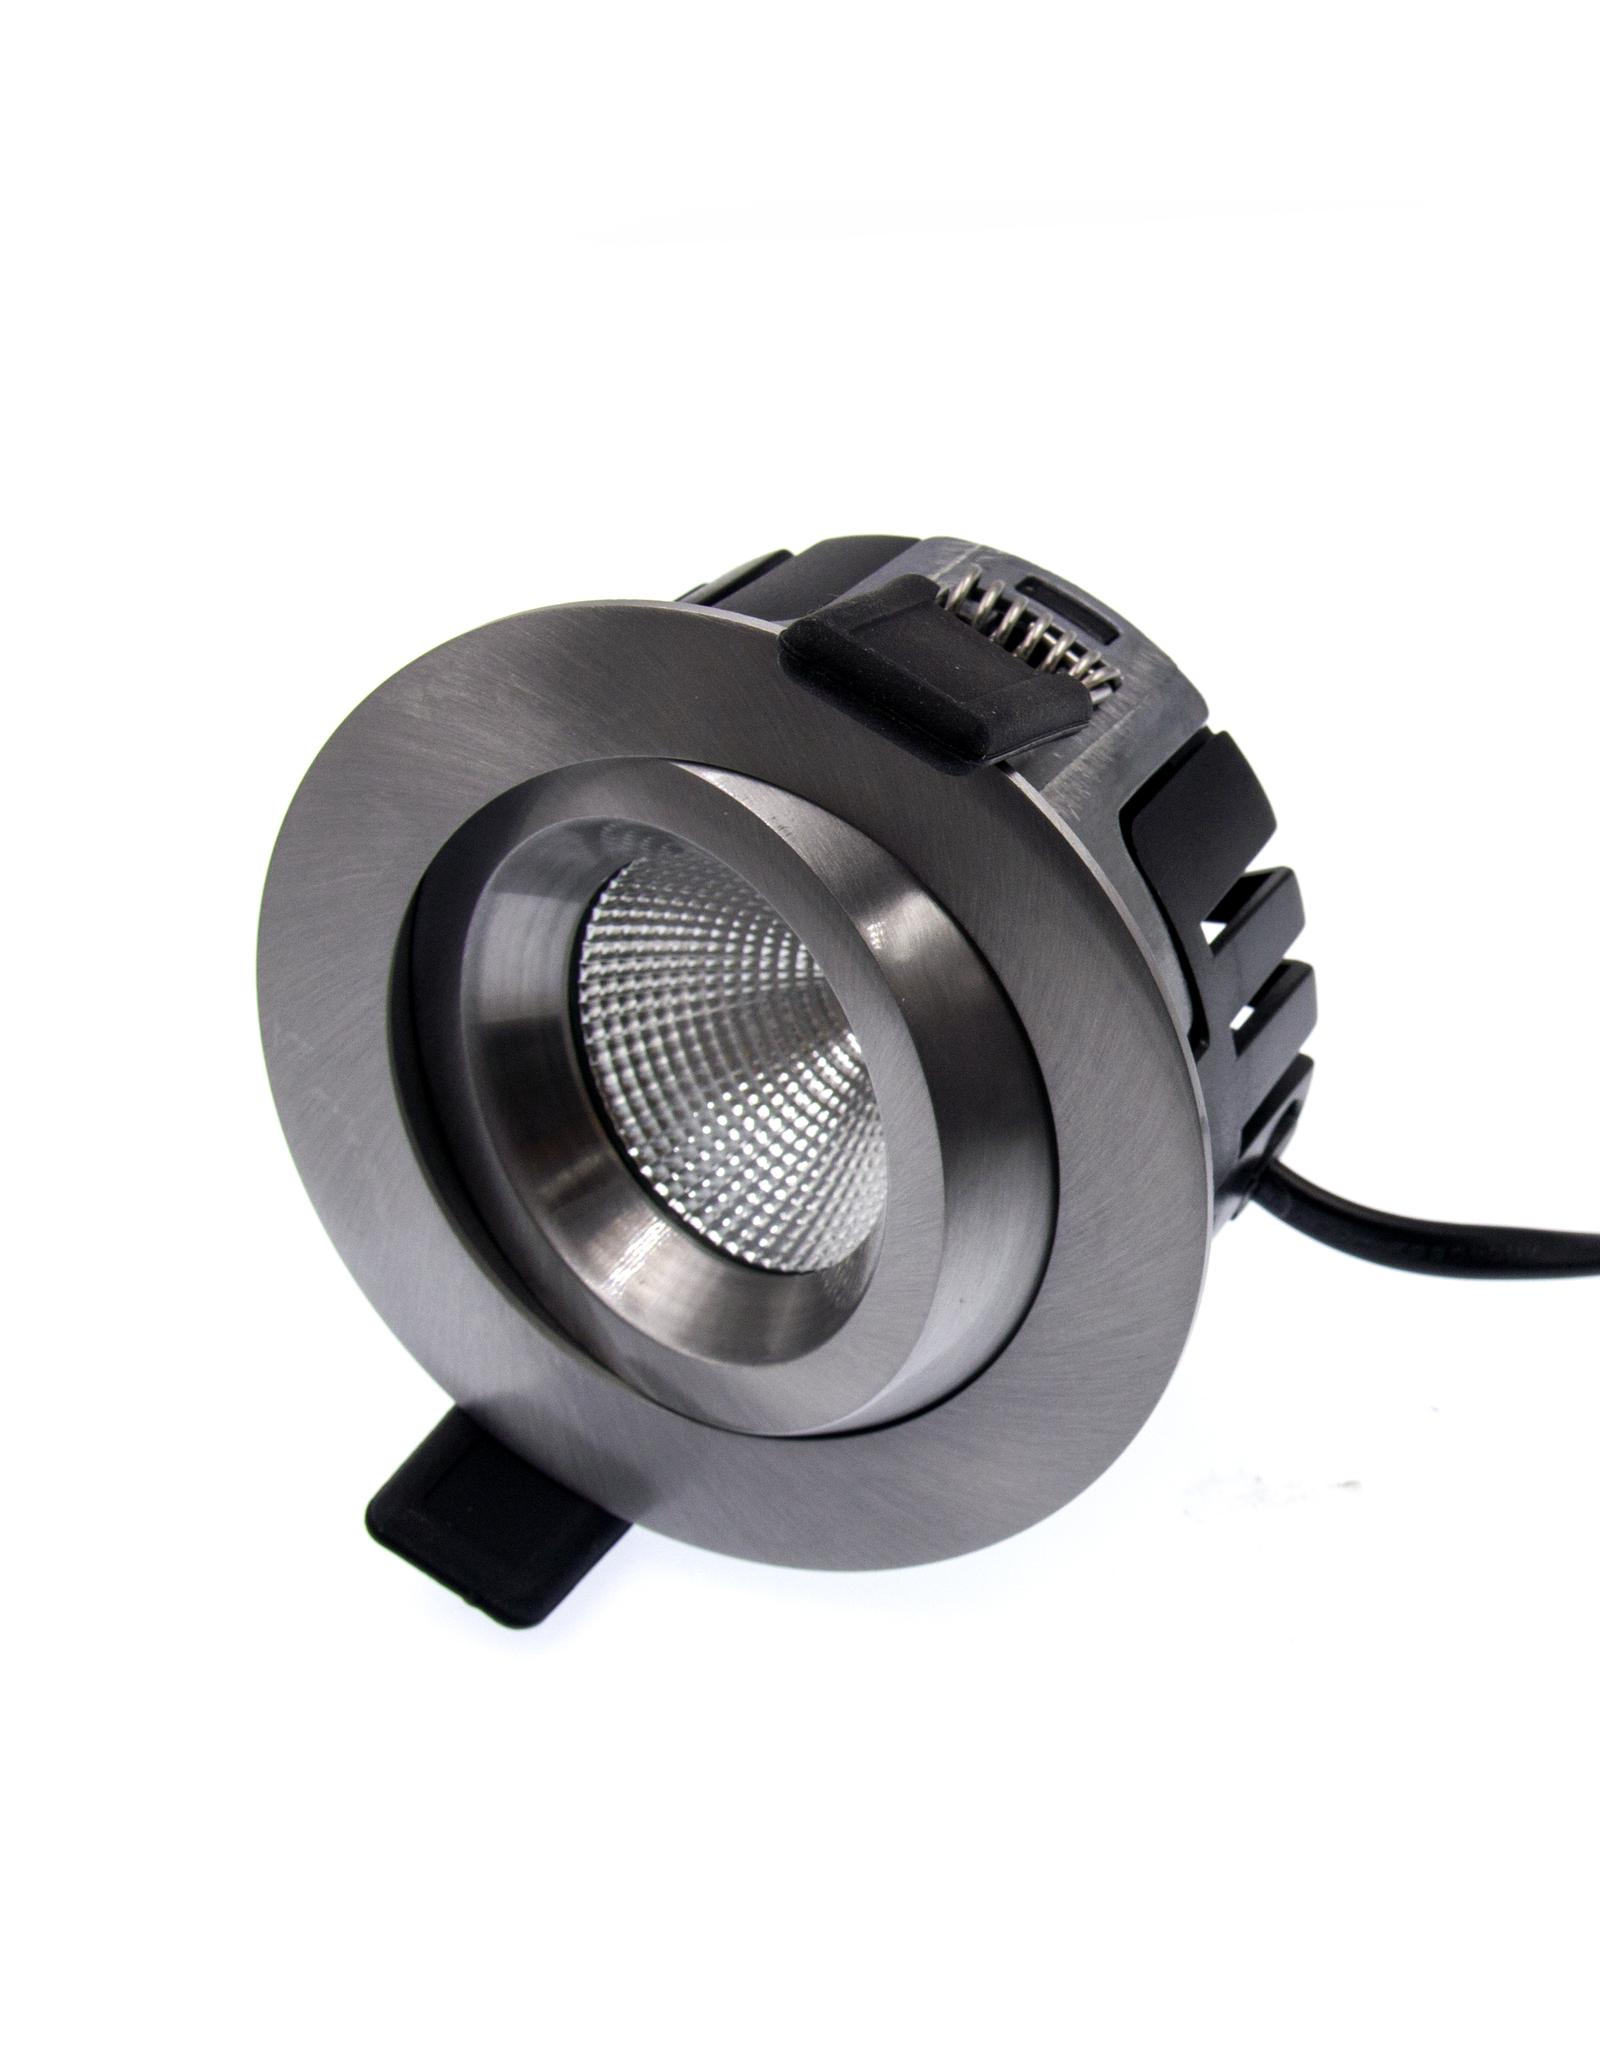 LedLed Tonny LED Kantelspot Rond RVS 2700k Dimbaar